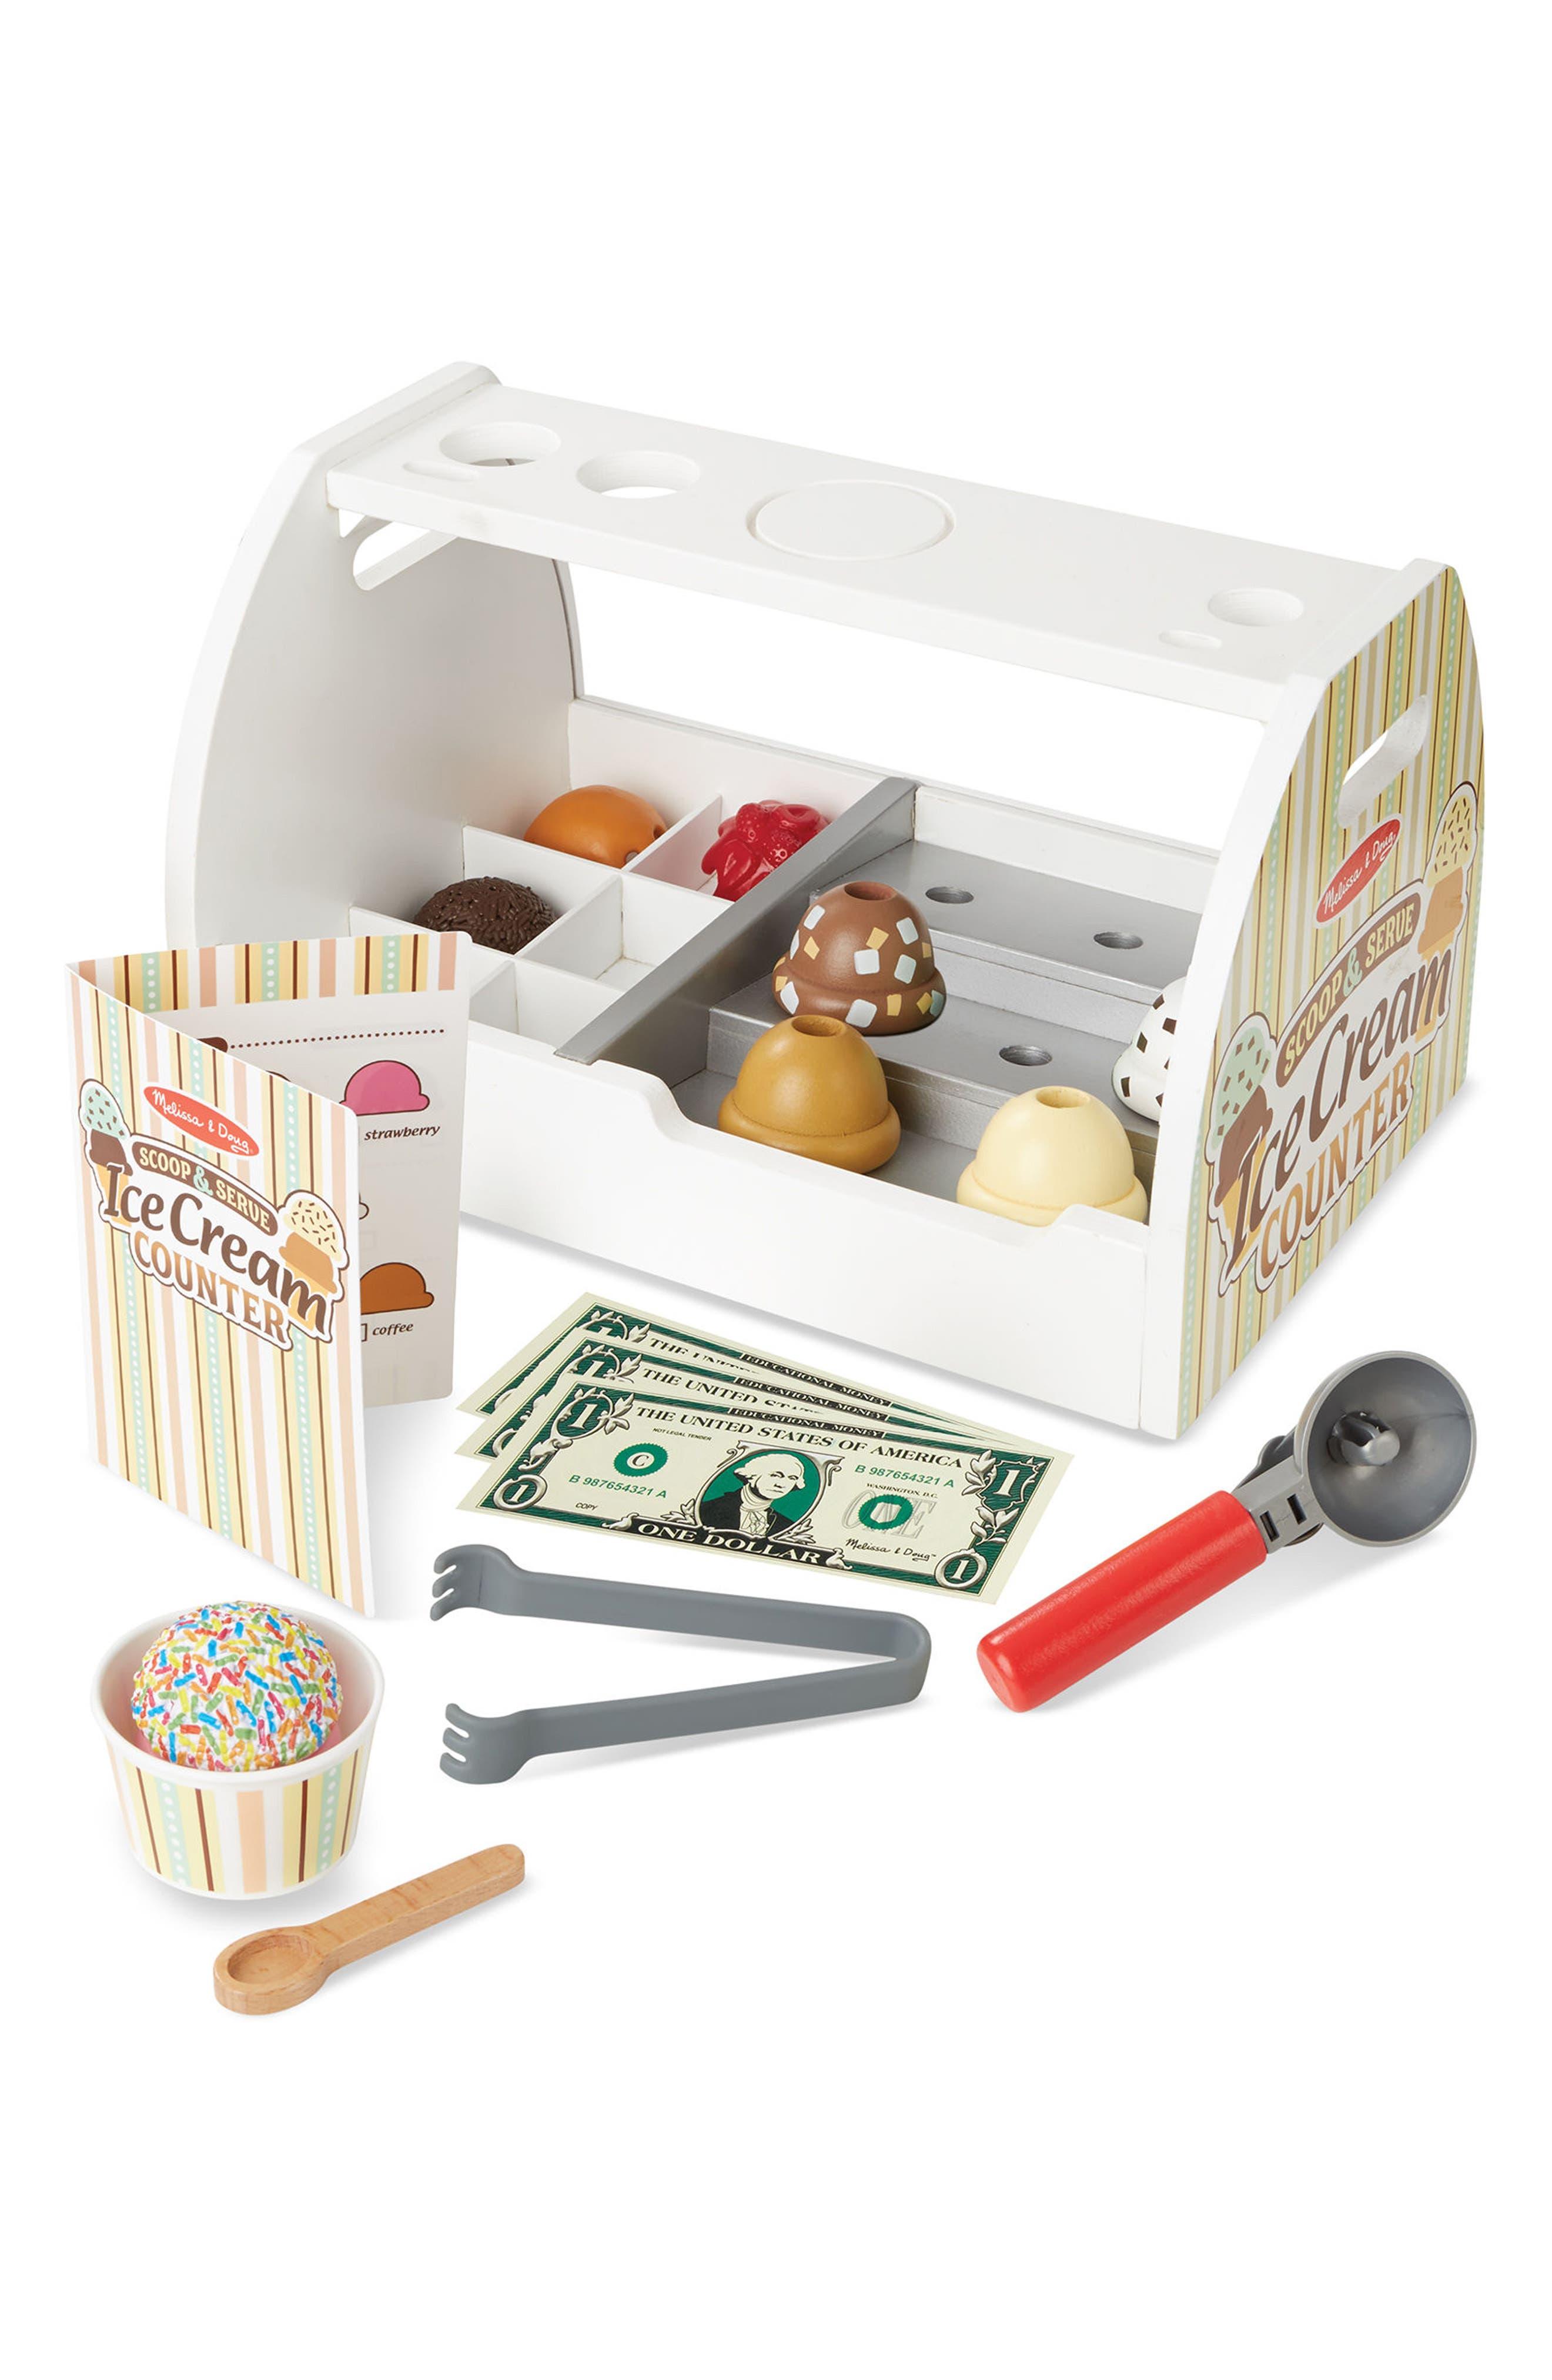 Ice Cream Counter Play Set,                             Main thumbnail 1, color,                             MULTI